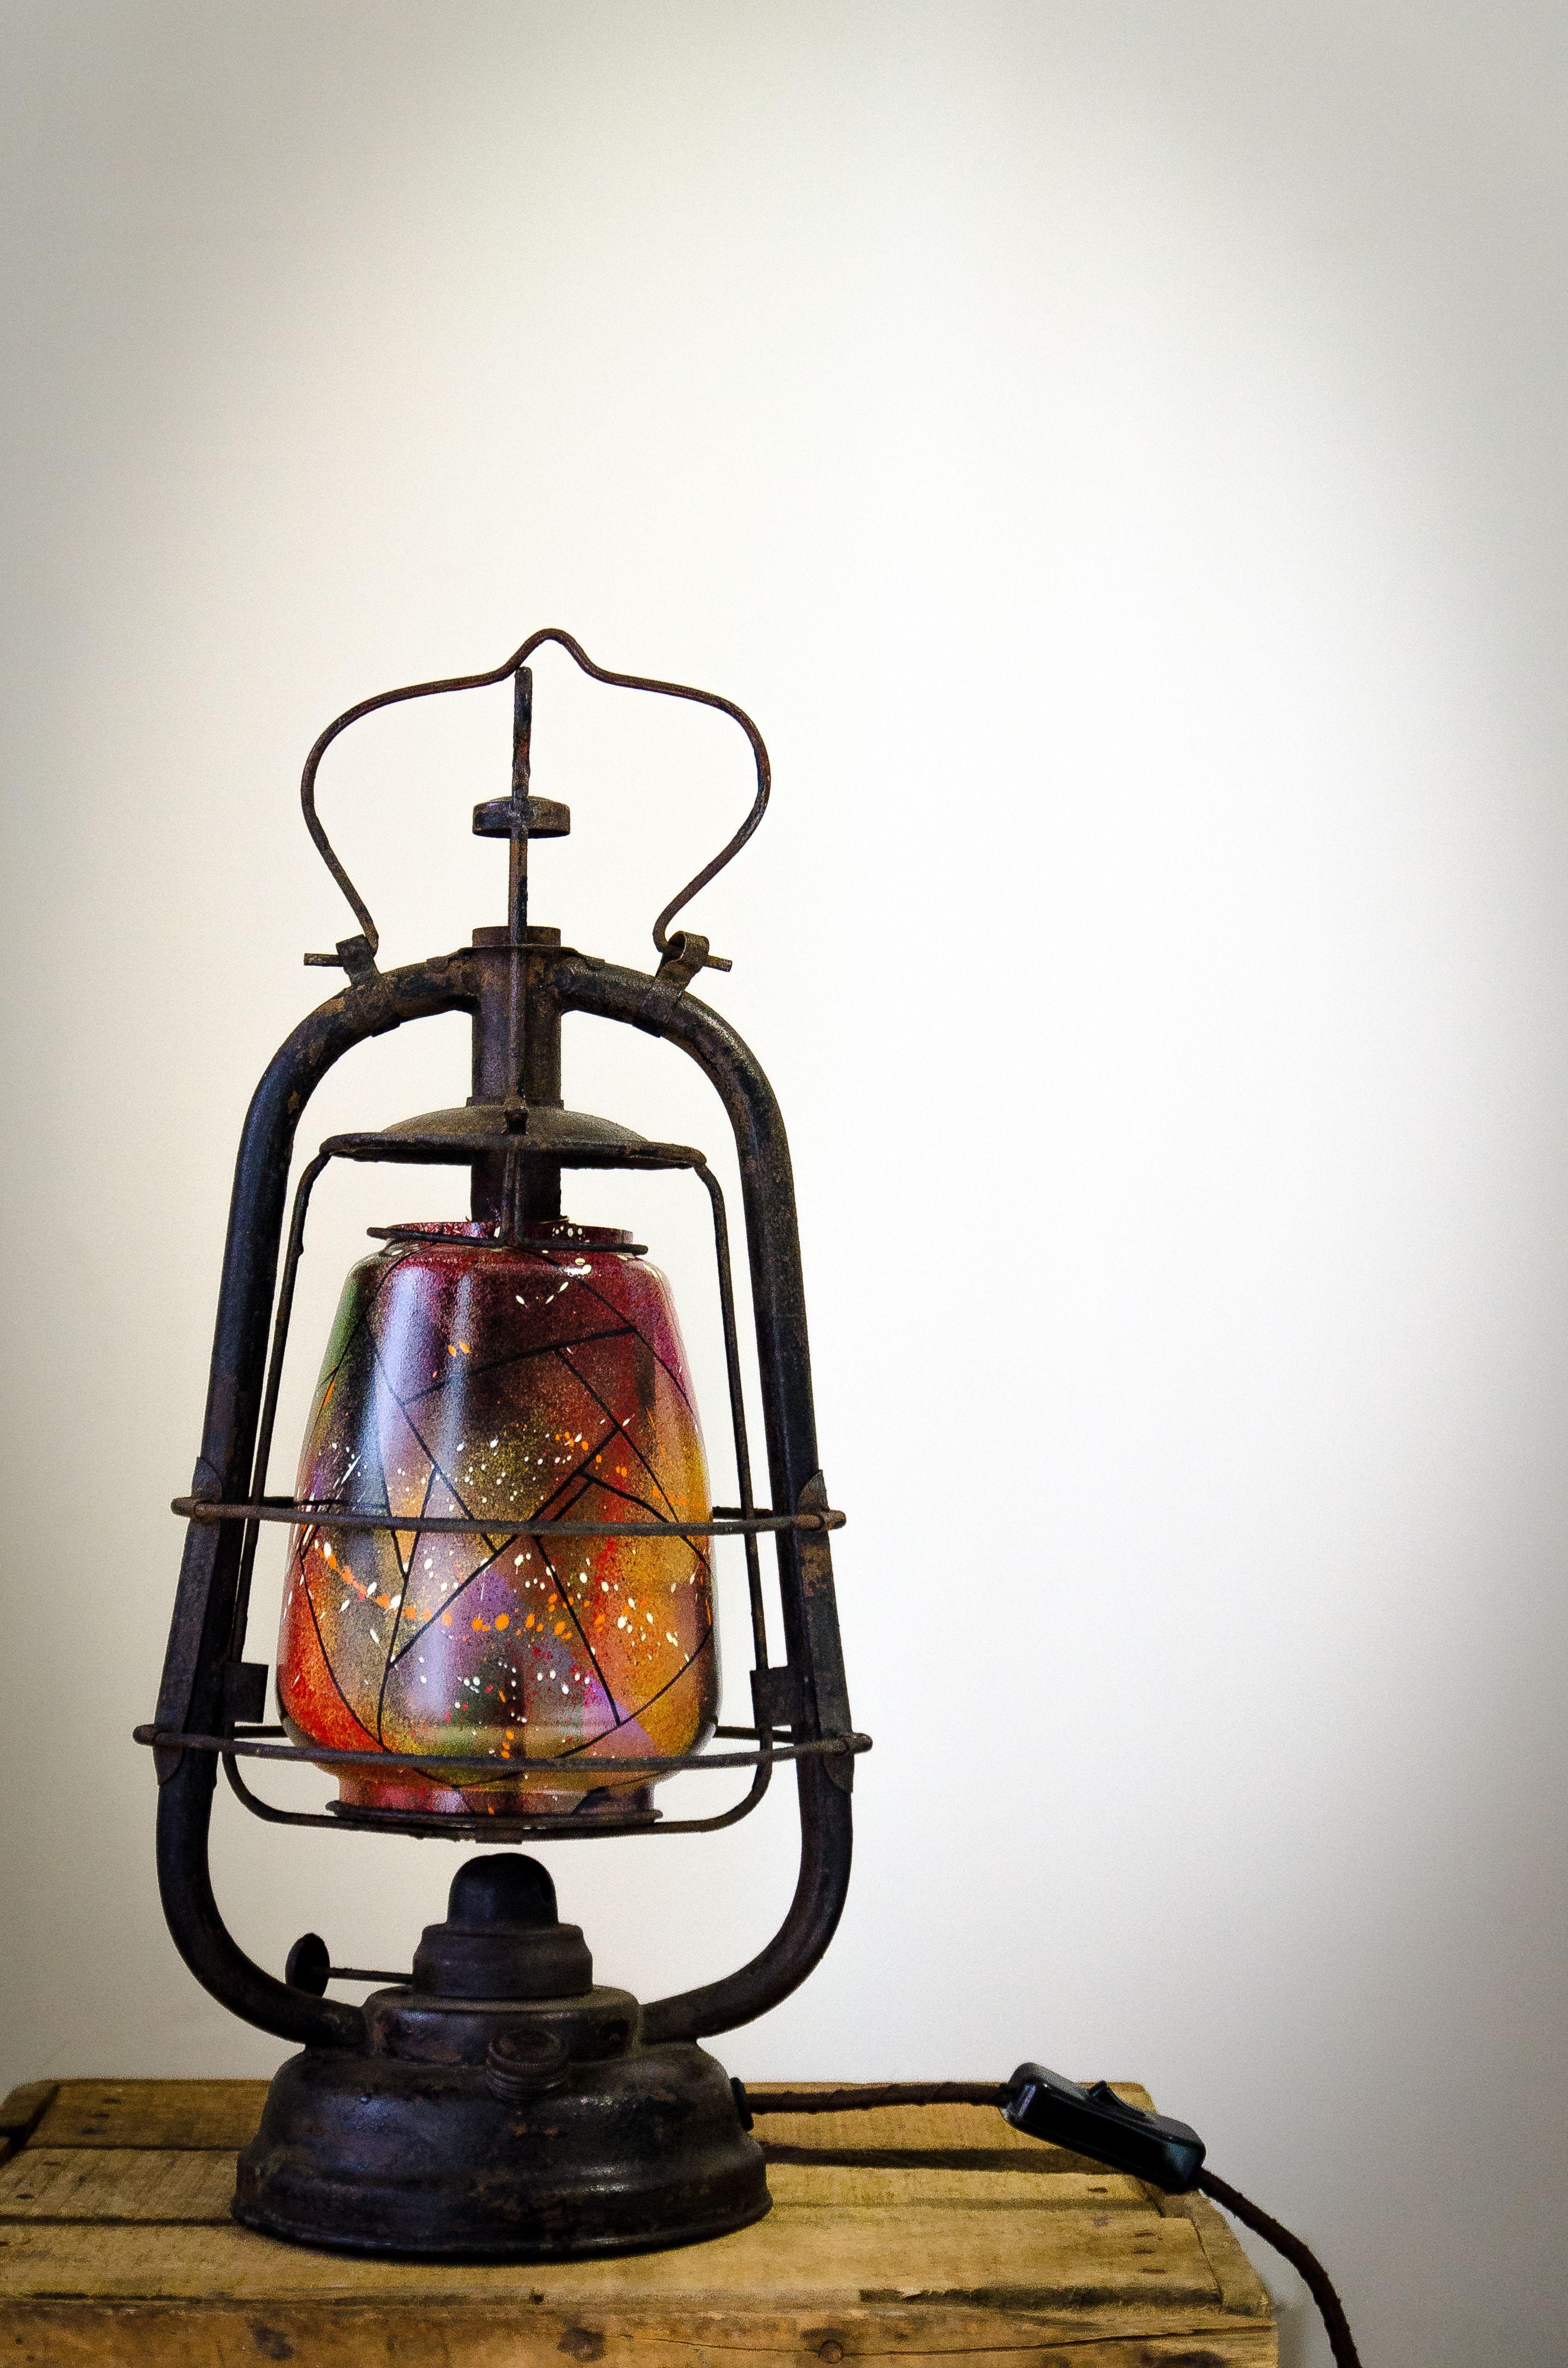 Simkone Custom Peintre En Lettres Chambery Vieilles Lampes Lampe A Petrole Lampe